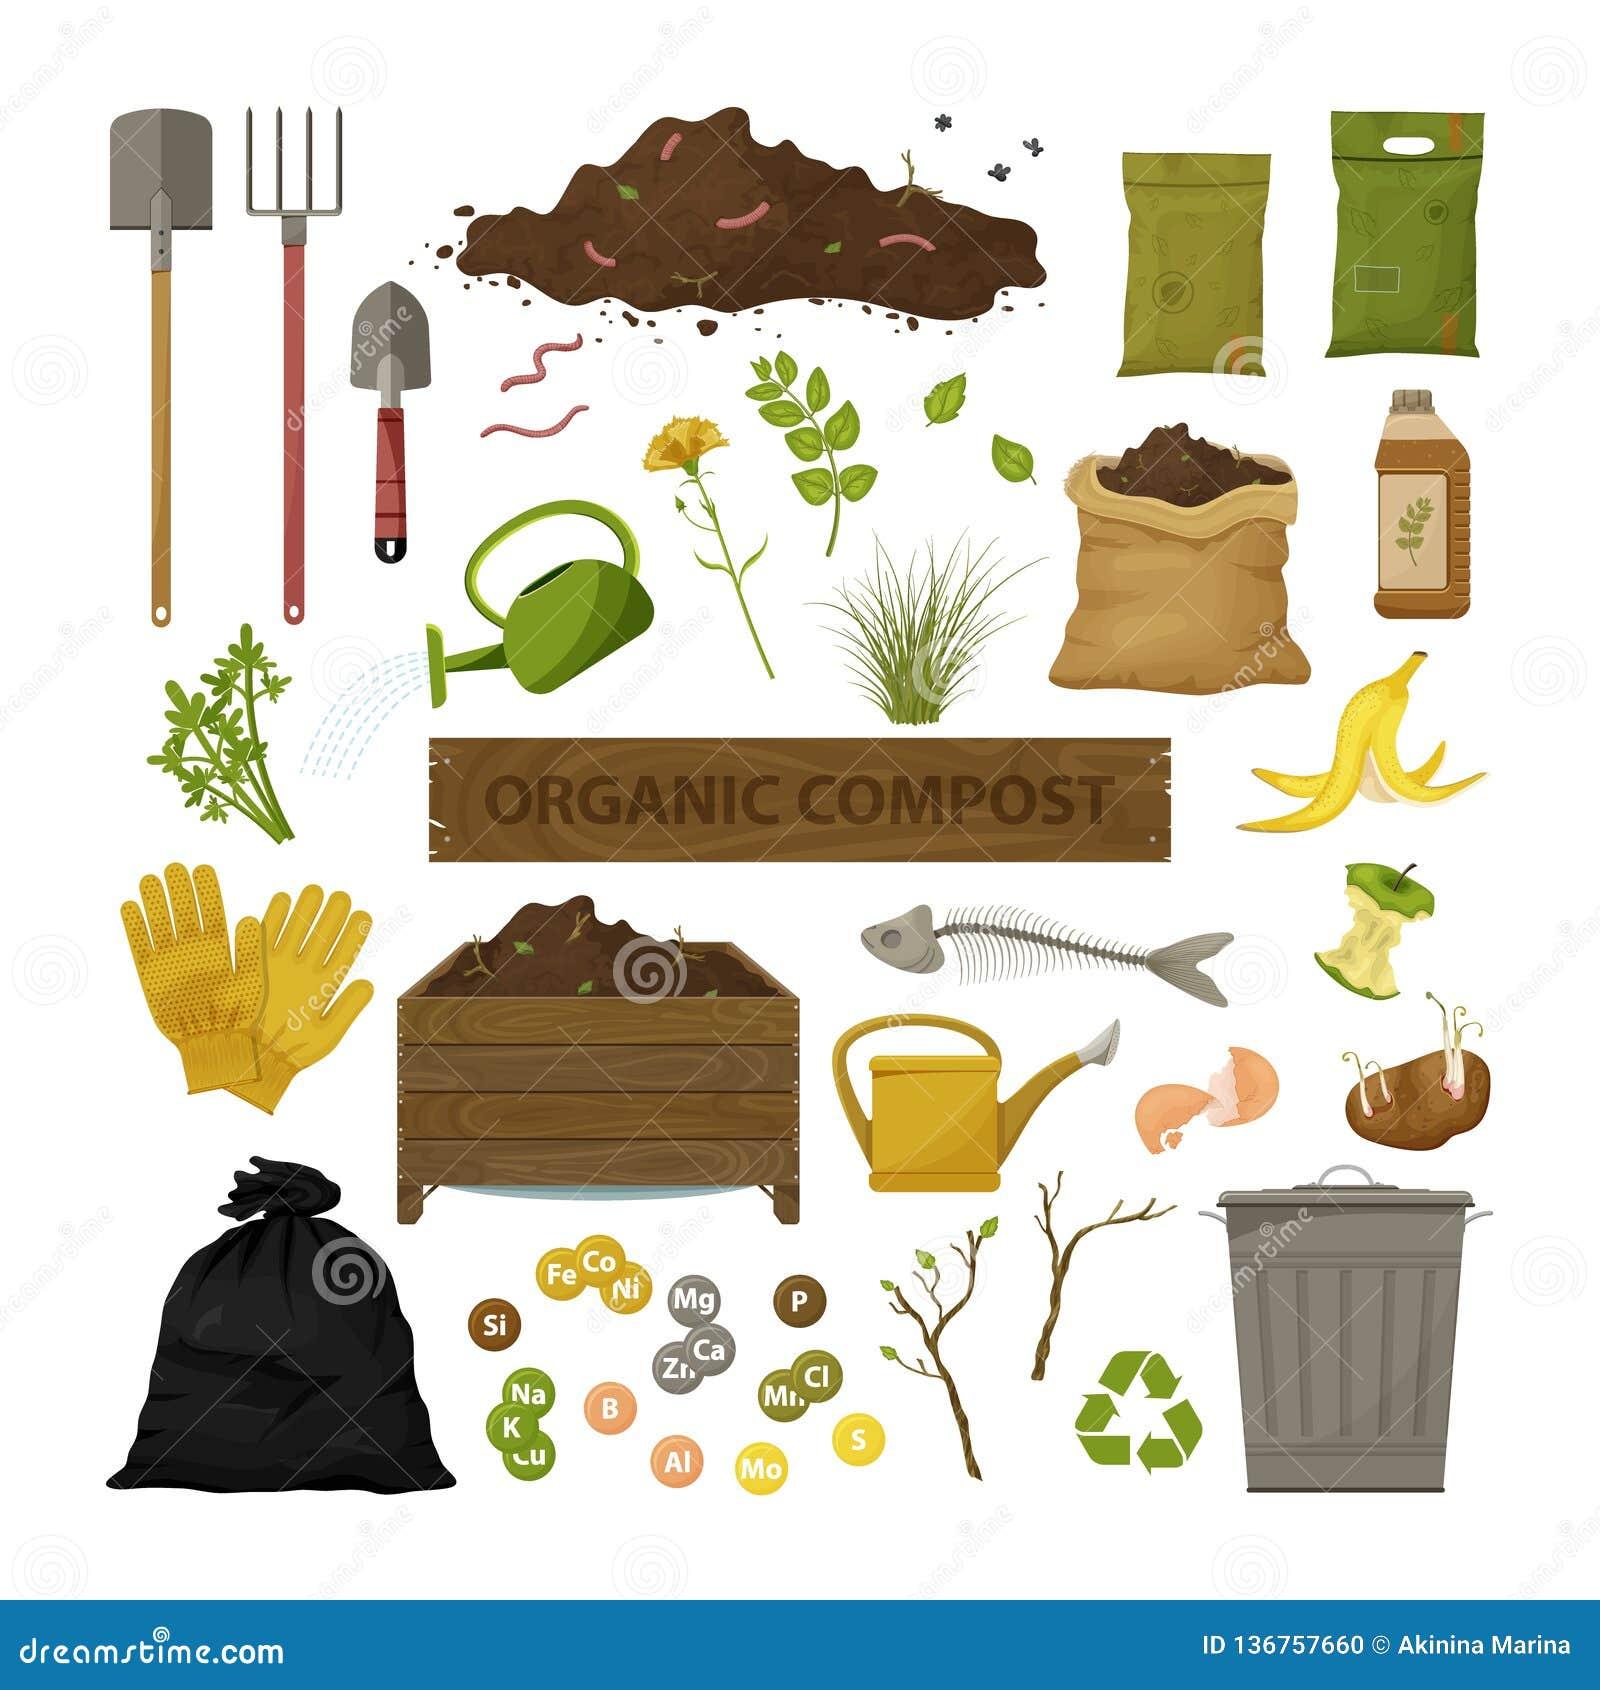 Set of cartoon flat icons. Organic compost theme. Garden tools, wooden box, ground, food garbage. Illustration of bio, organic